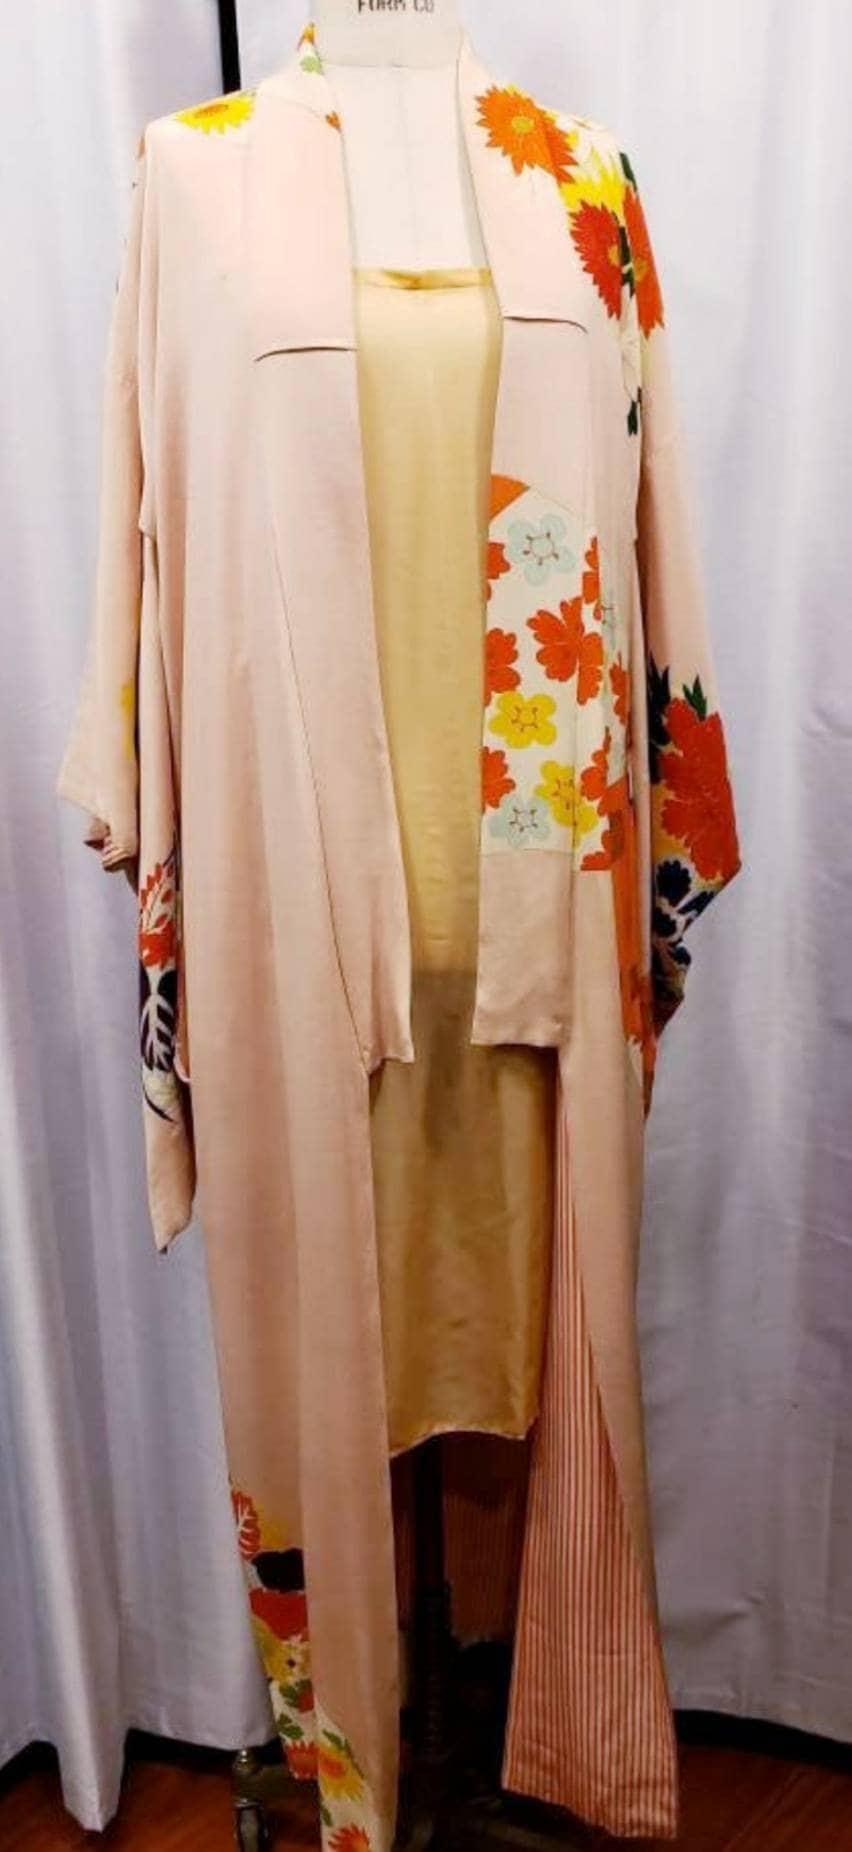 1950s Hats: Pillbox, Fascinator, Wedding, Sun Hats Womens  Beautiful Kimono 1930s 1940s 1950s Unisex Amazing Incredible Colorful Robe Jacket Evening $64.40 AT vintagedancer.com